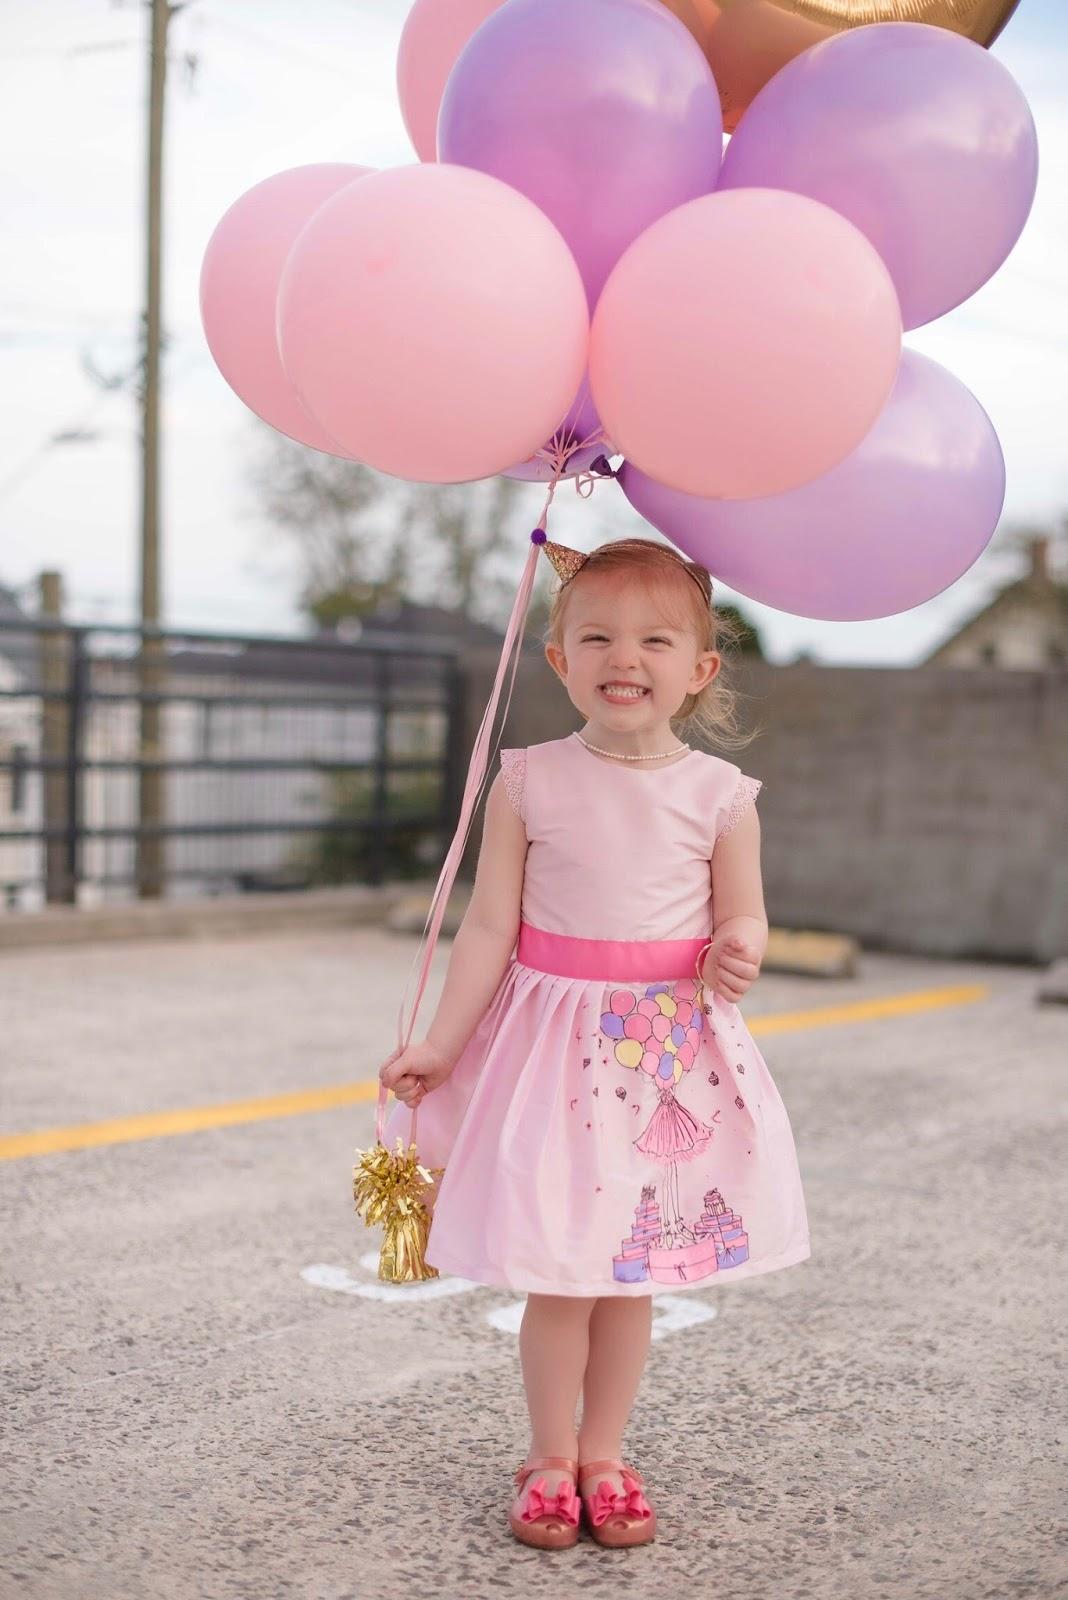 Madeline turns 3 - Something Delightful Blog